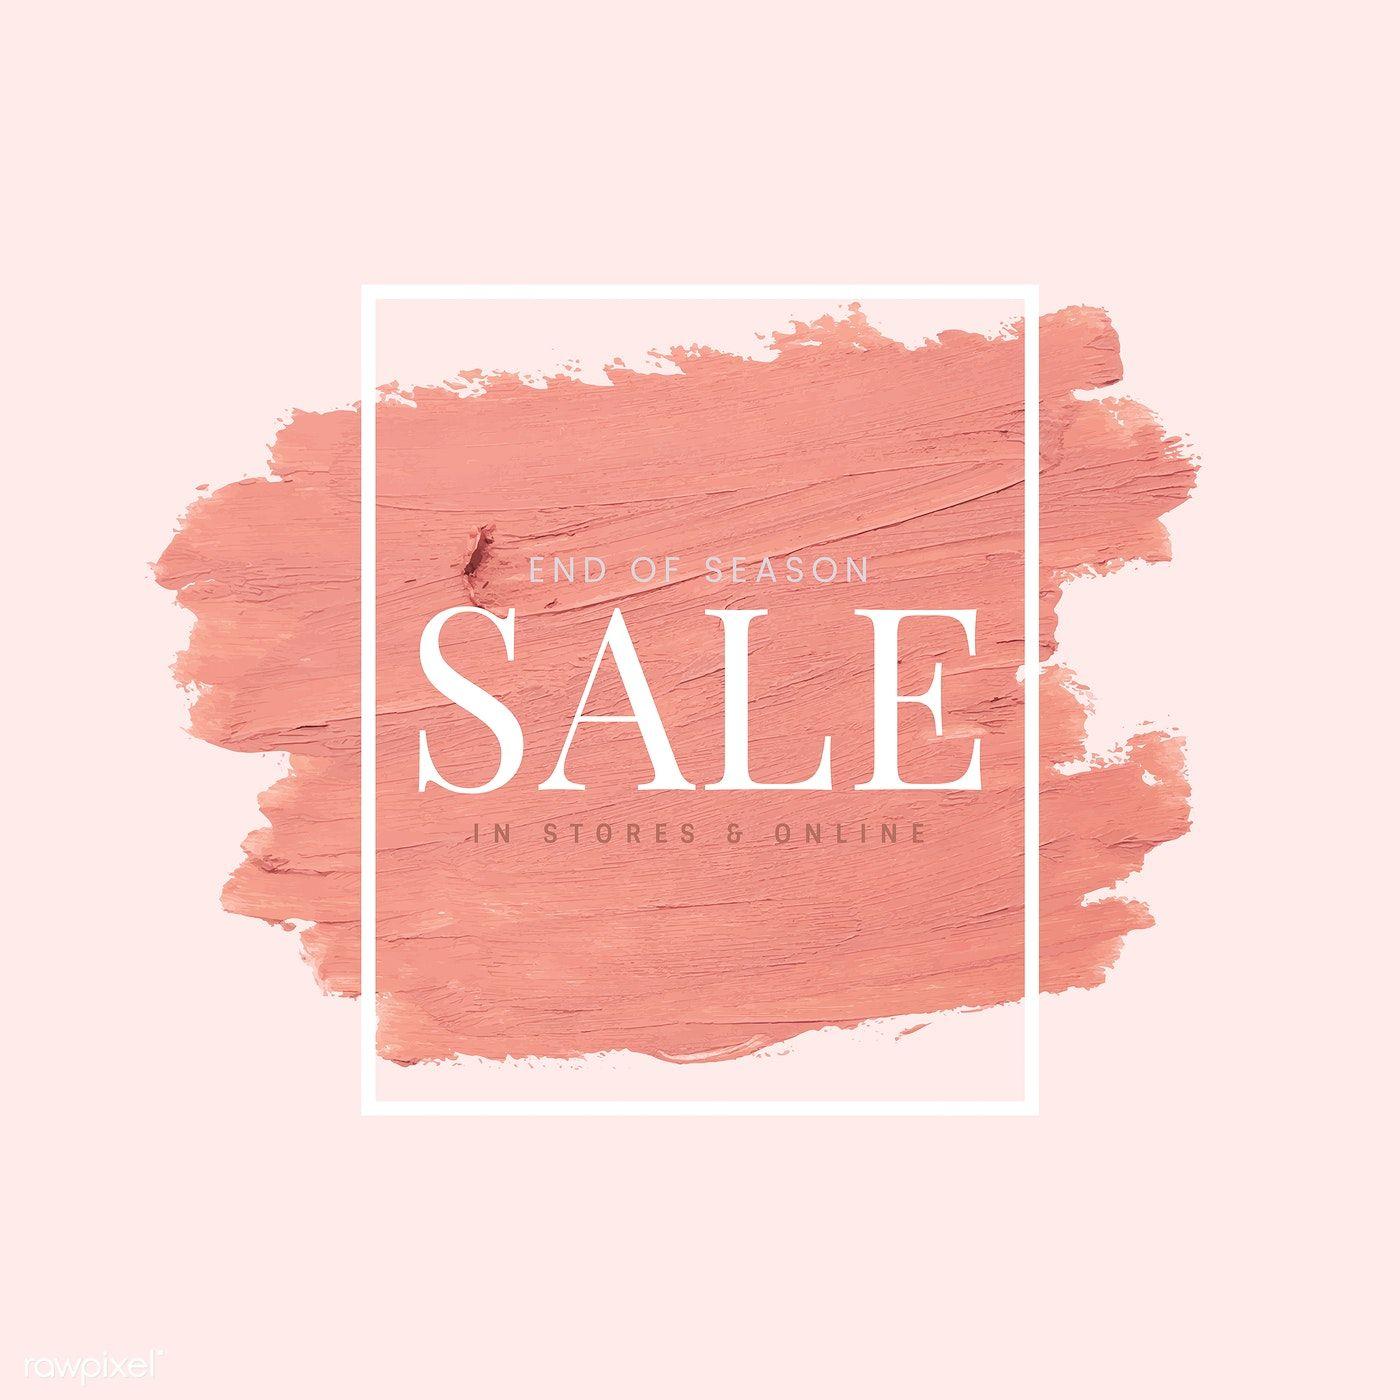 Download Premium Vector Of End Of Season Sale Vector 552267 Promotional Design Sale Poster Photo Frame Design